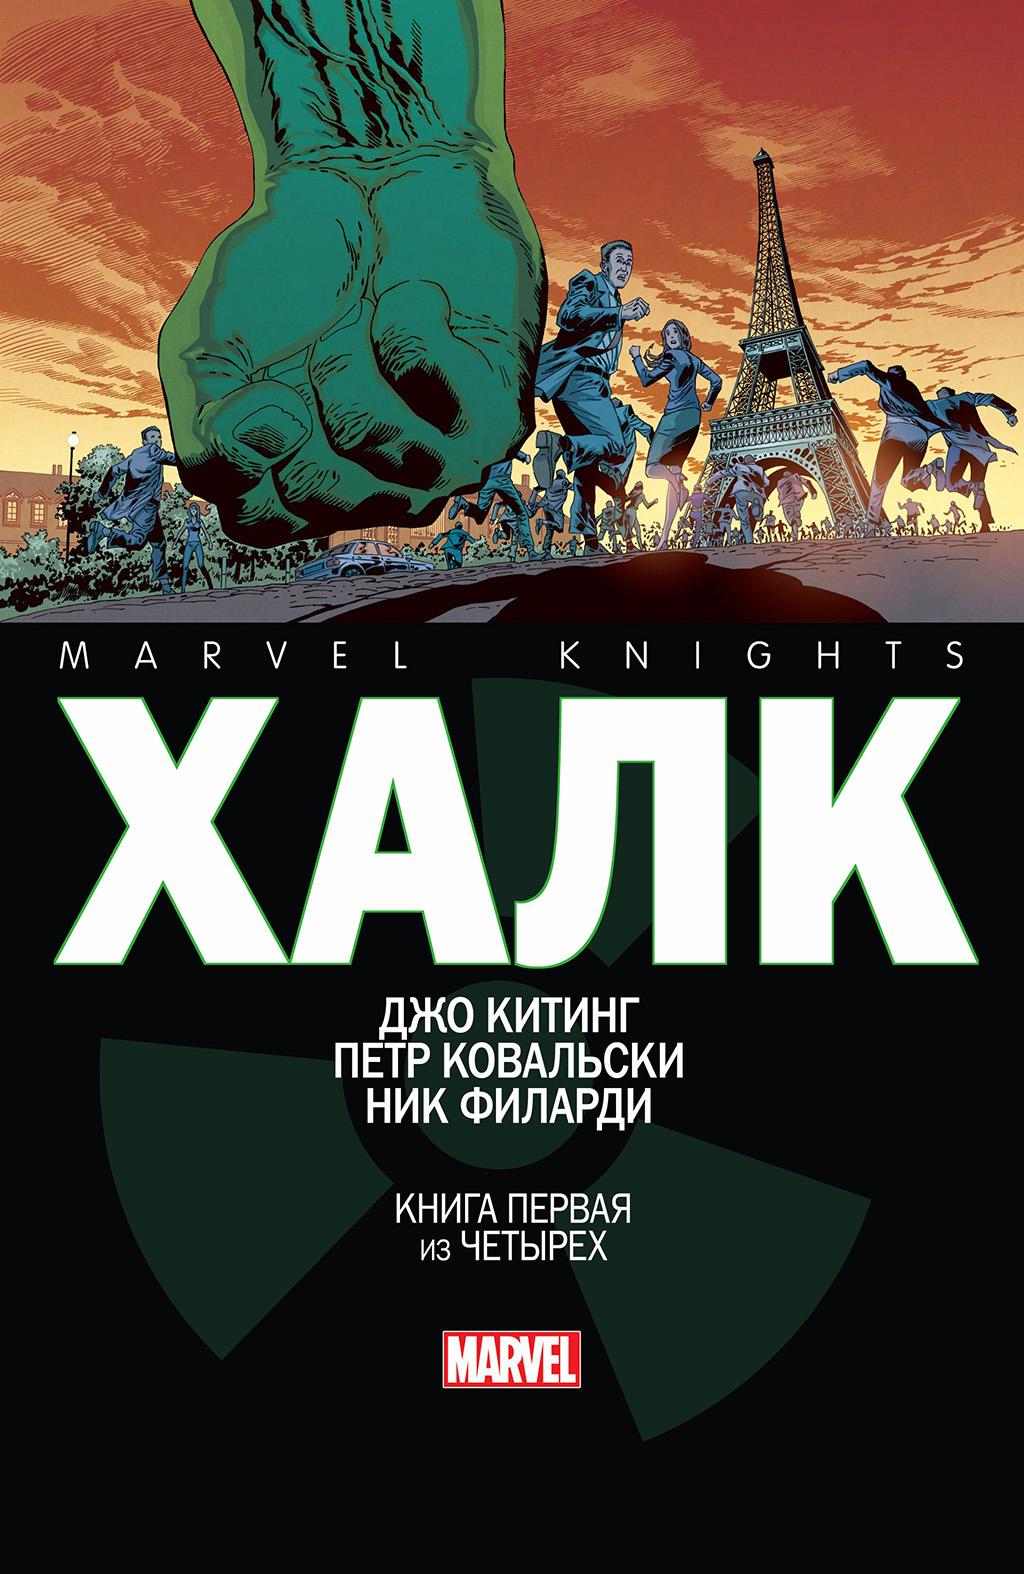 Комикс Рыцари Марвел: Халк